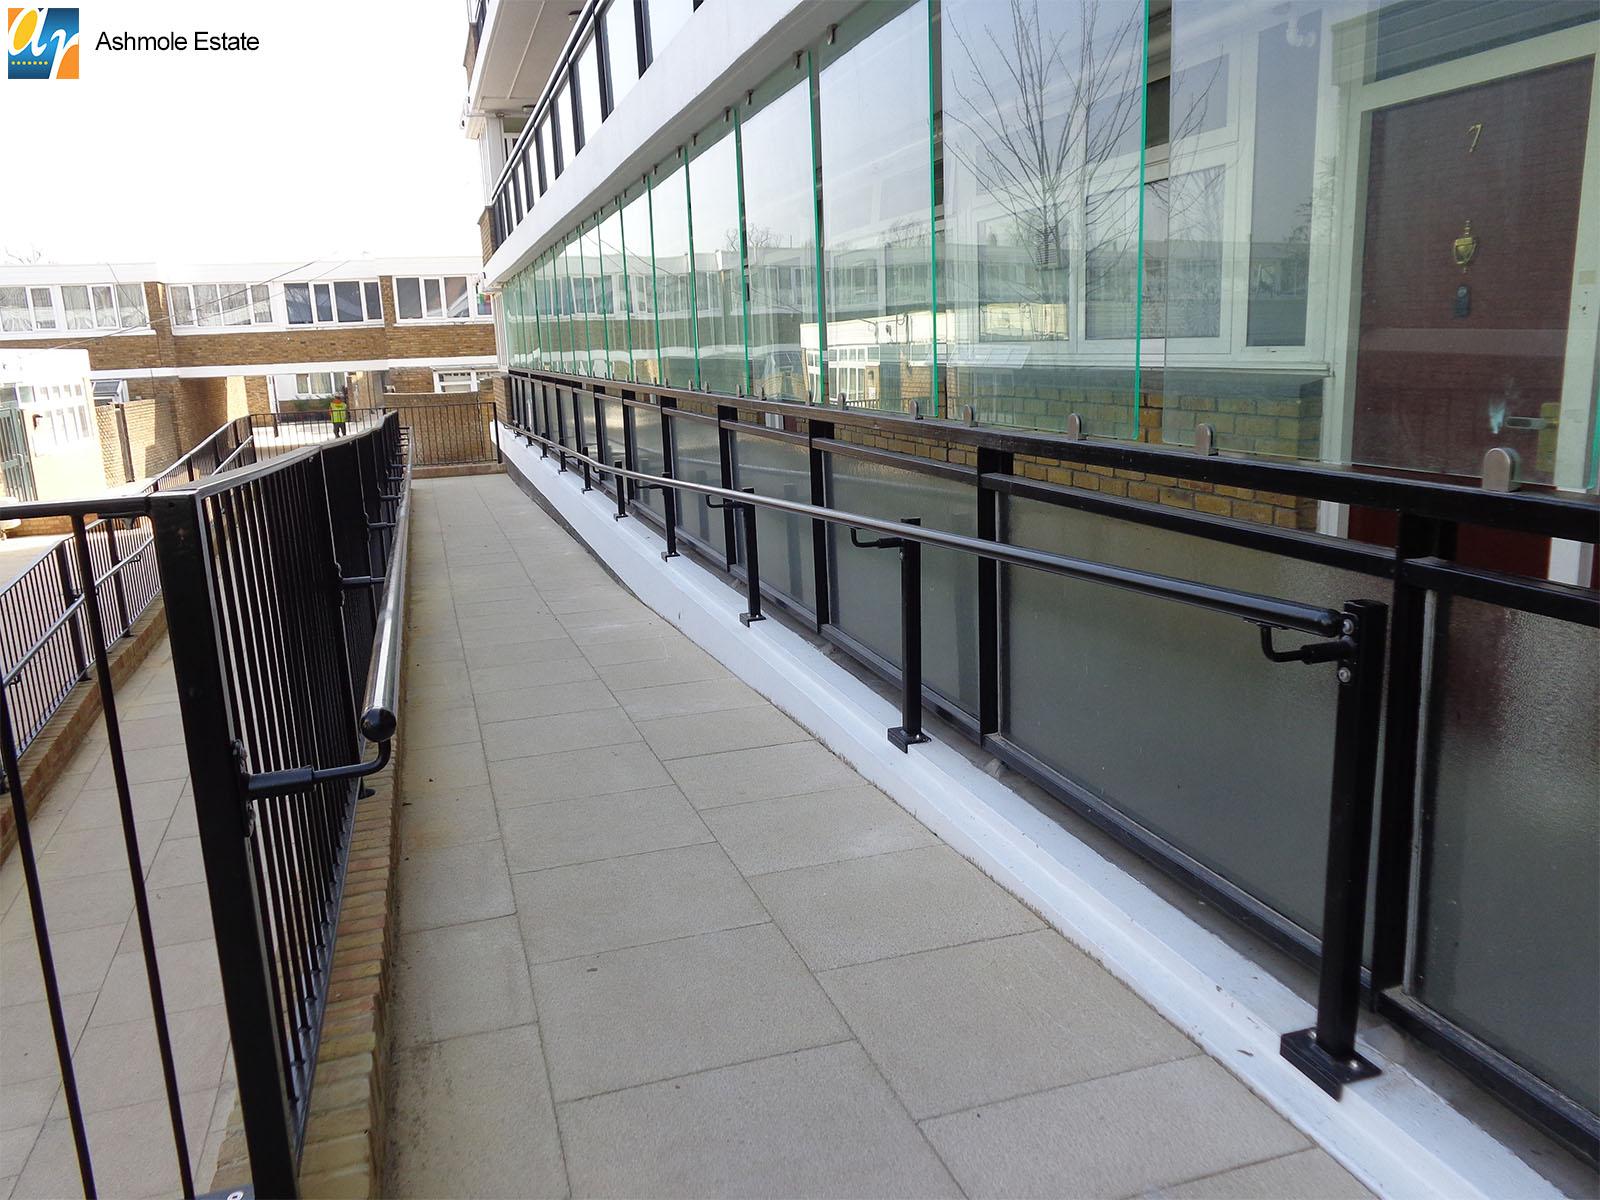 Ashmole Estate balustrade